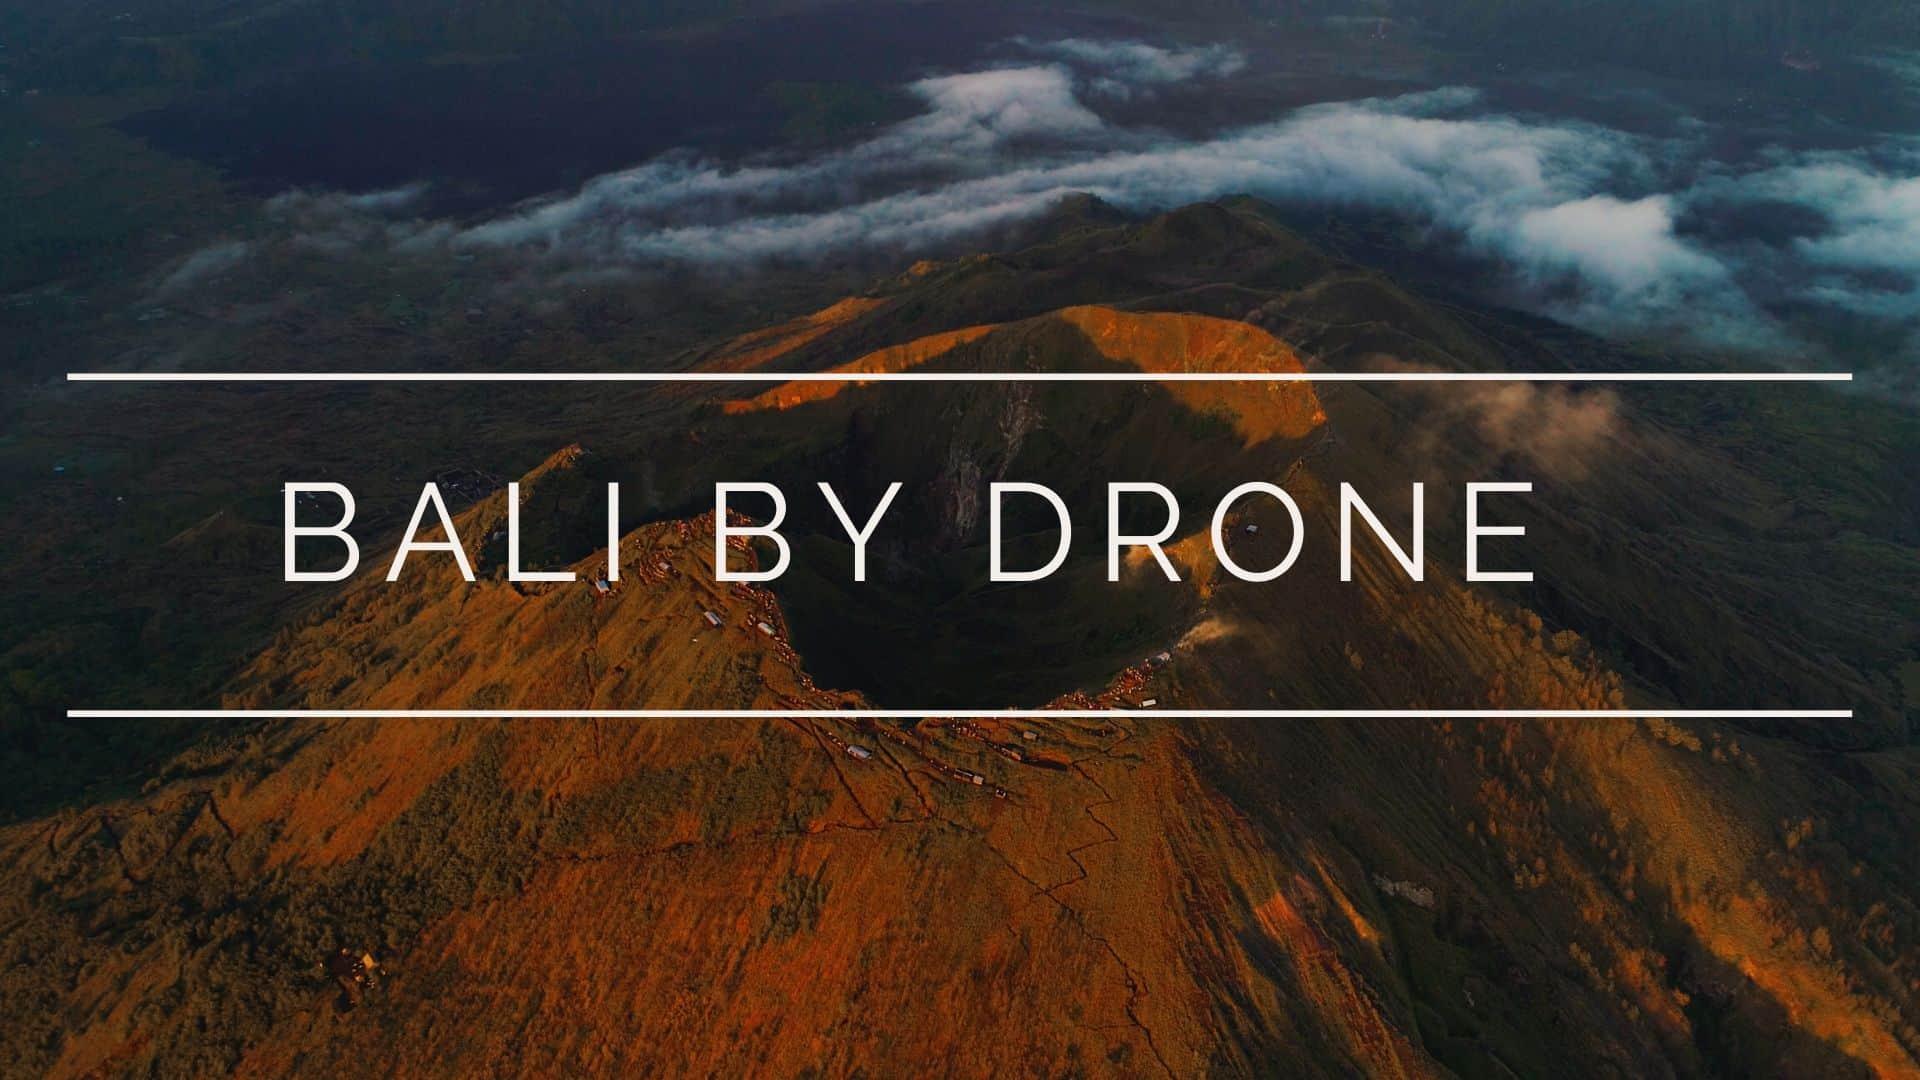 bali-by-drone-short-aerial-film